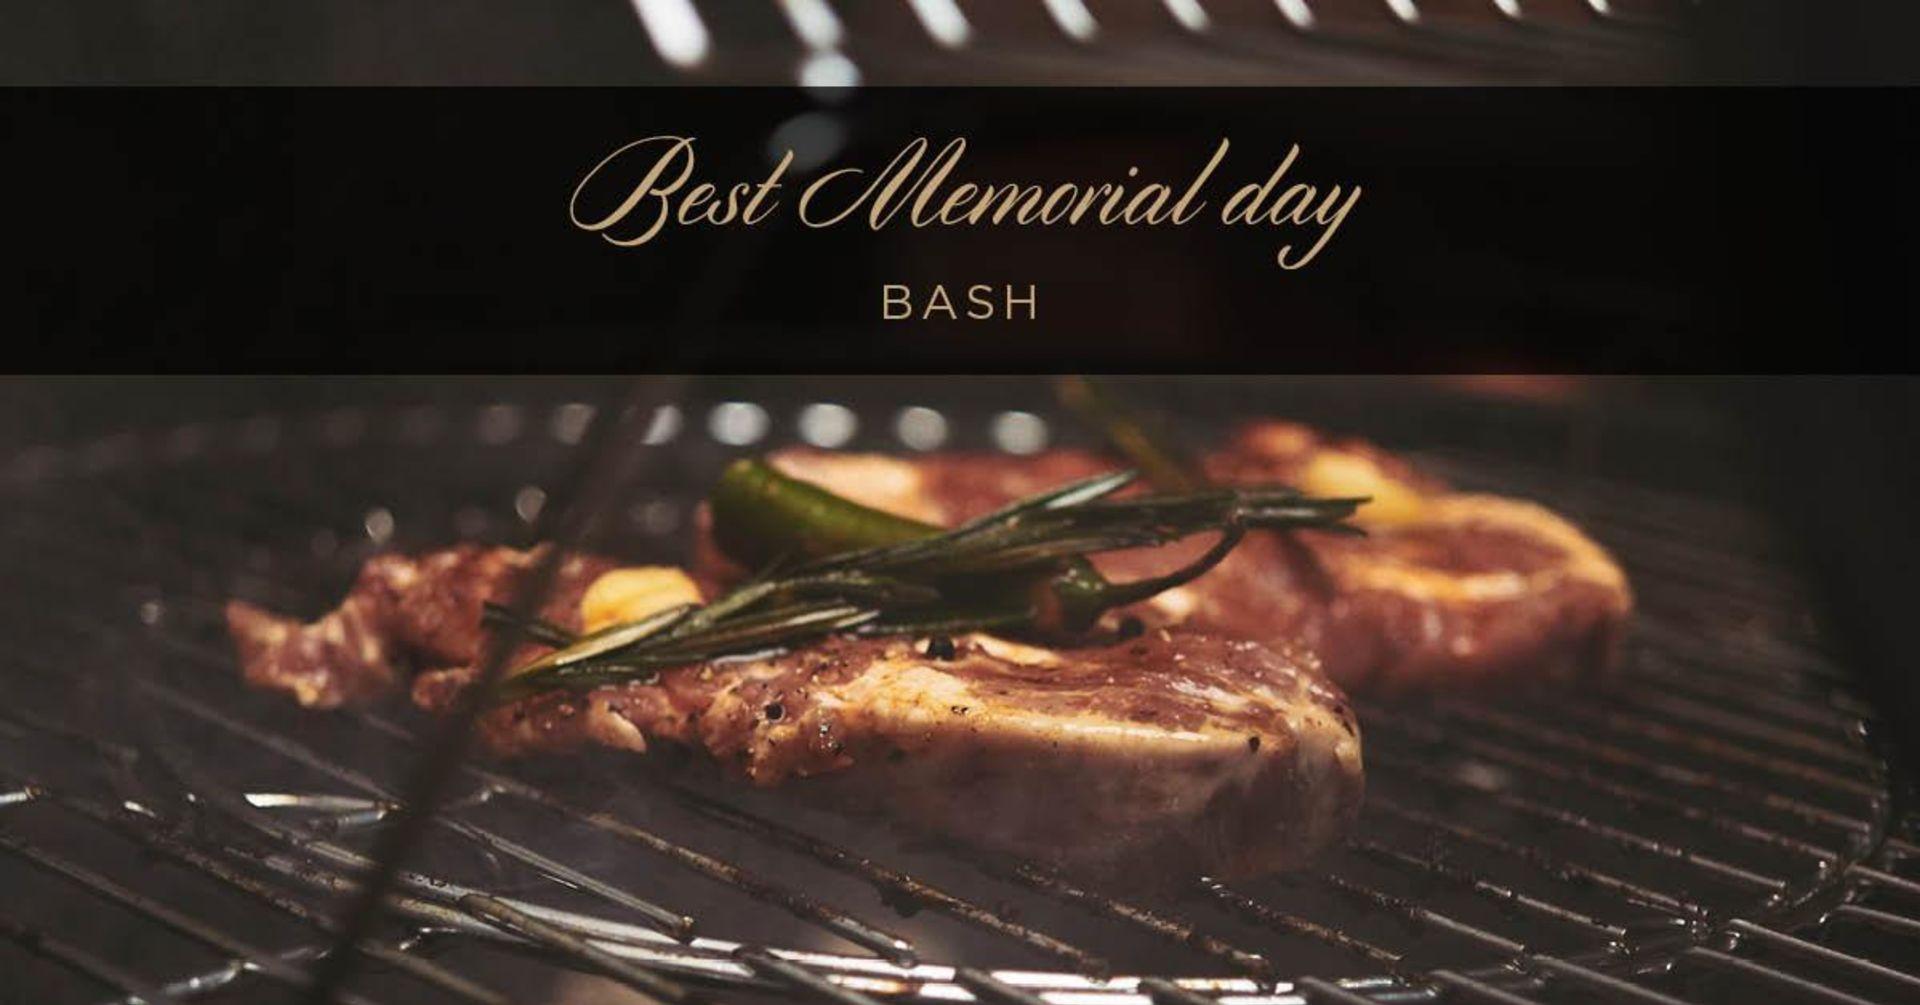 Best Memorial Day Bash